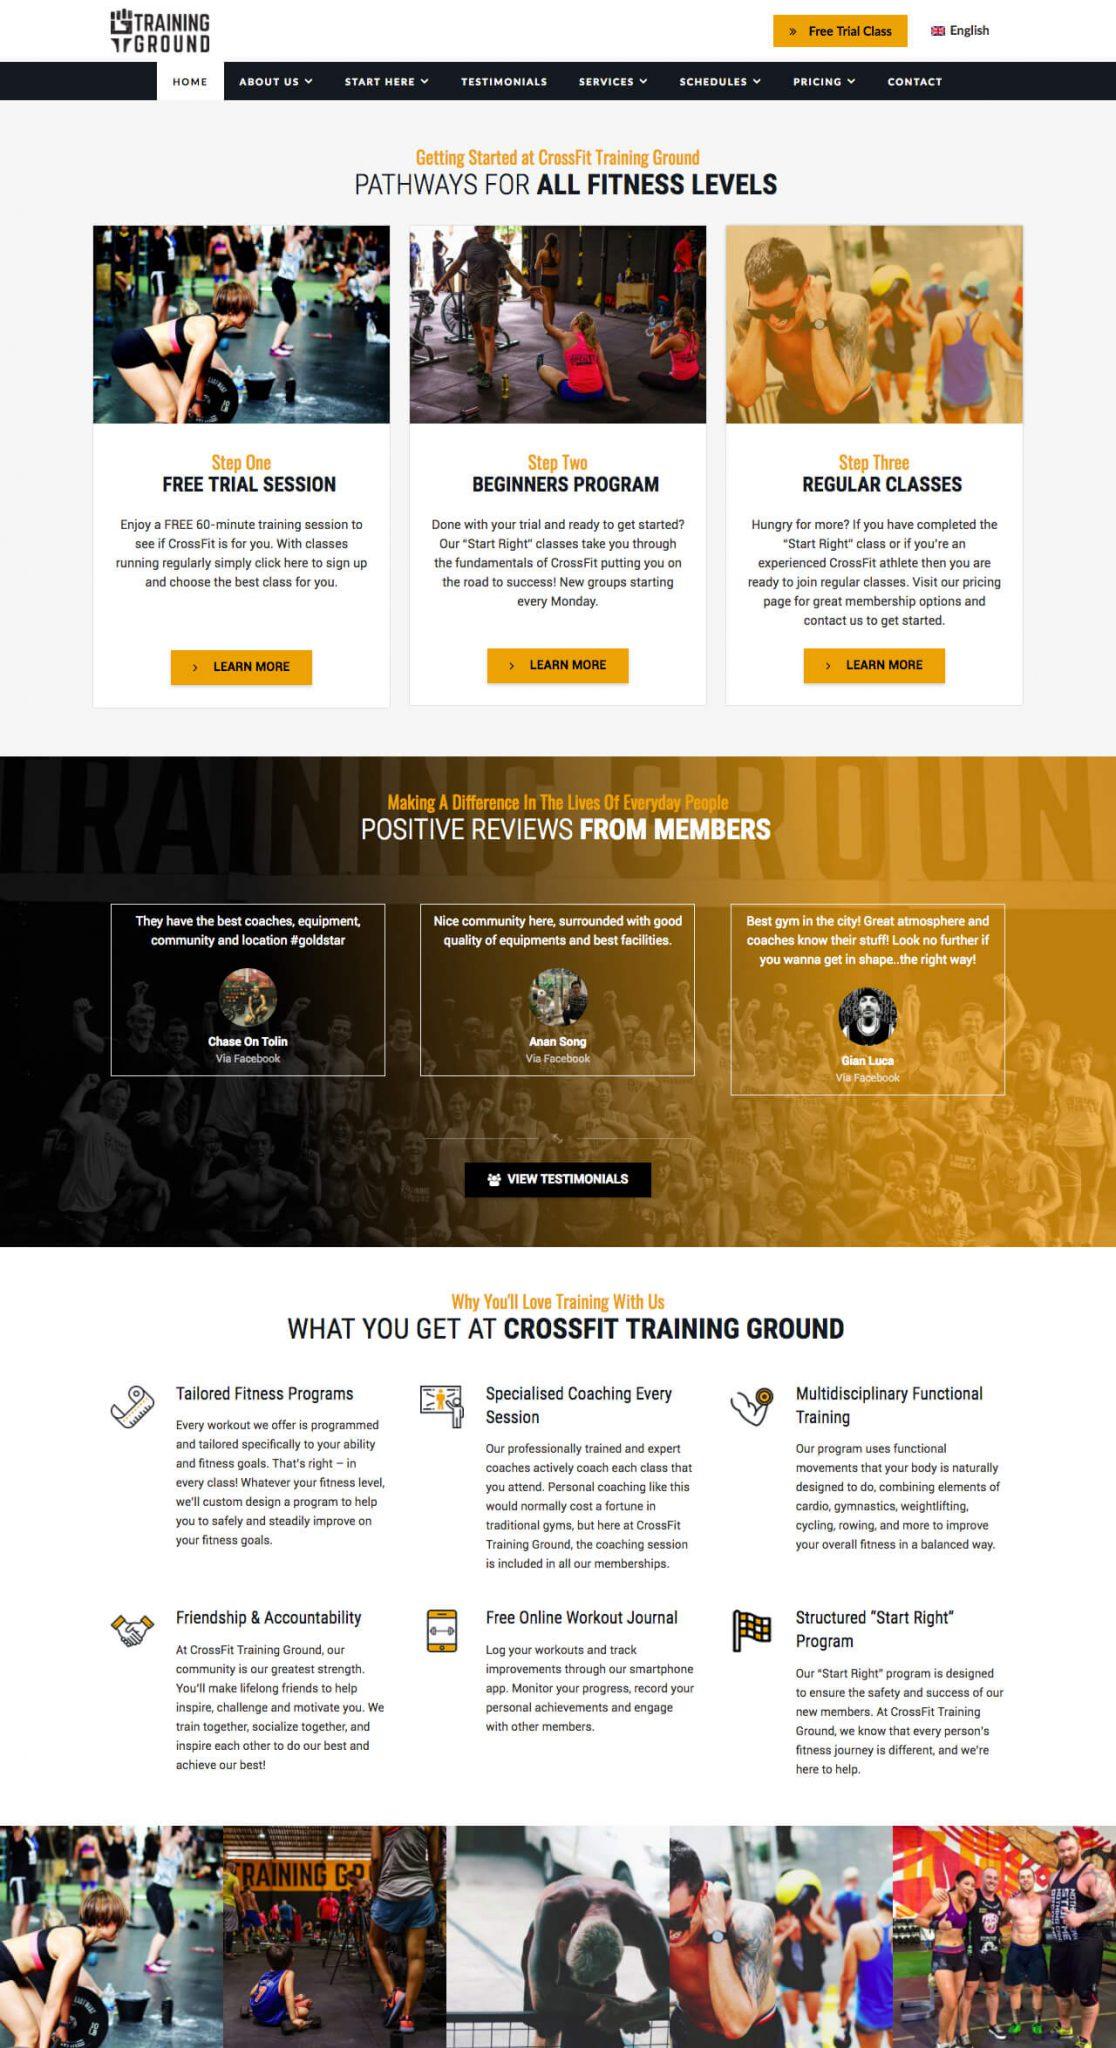 Fitness in Training by Monda Logo